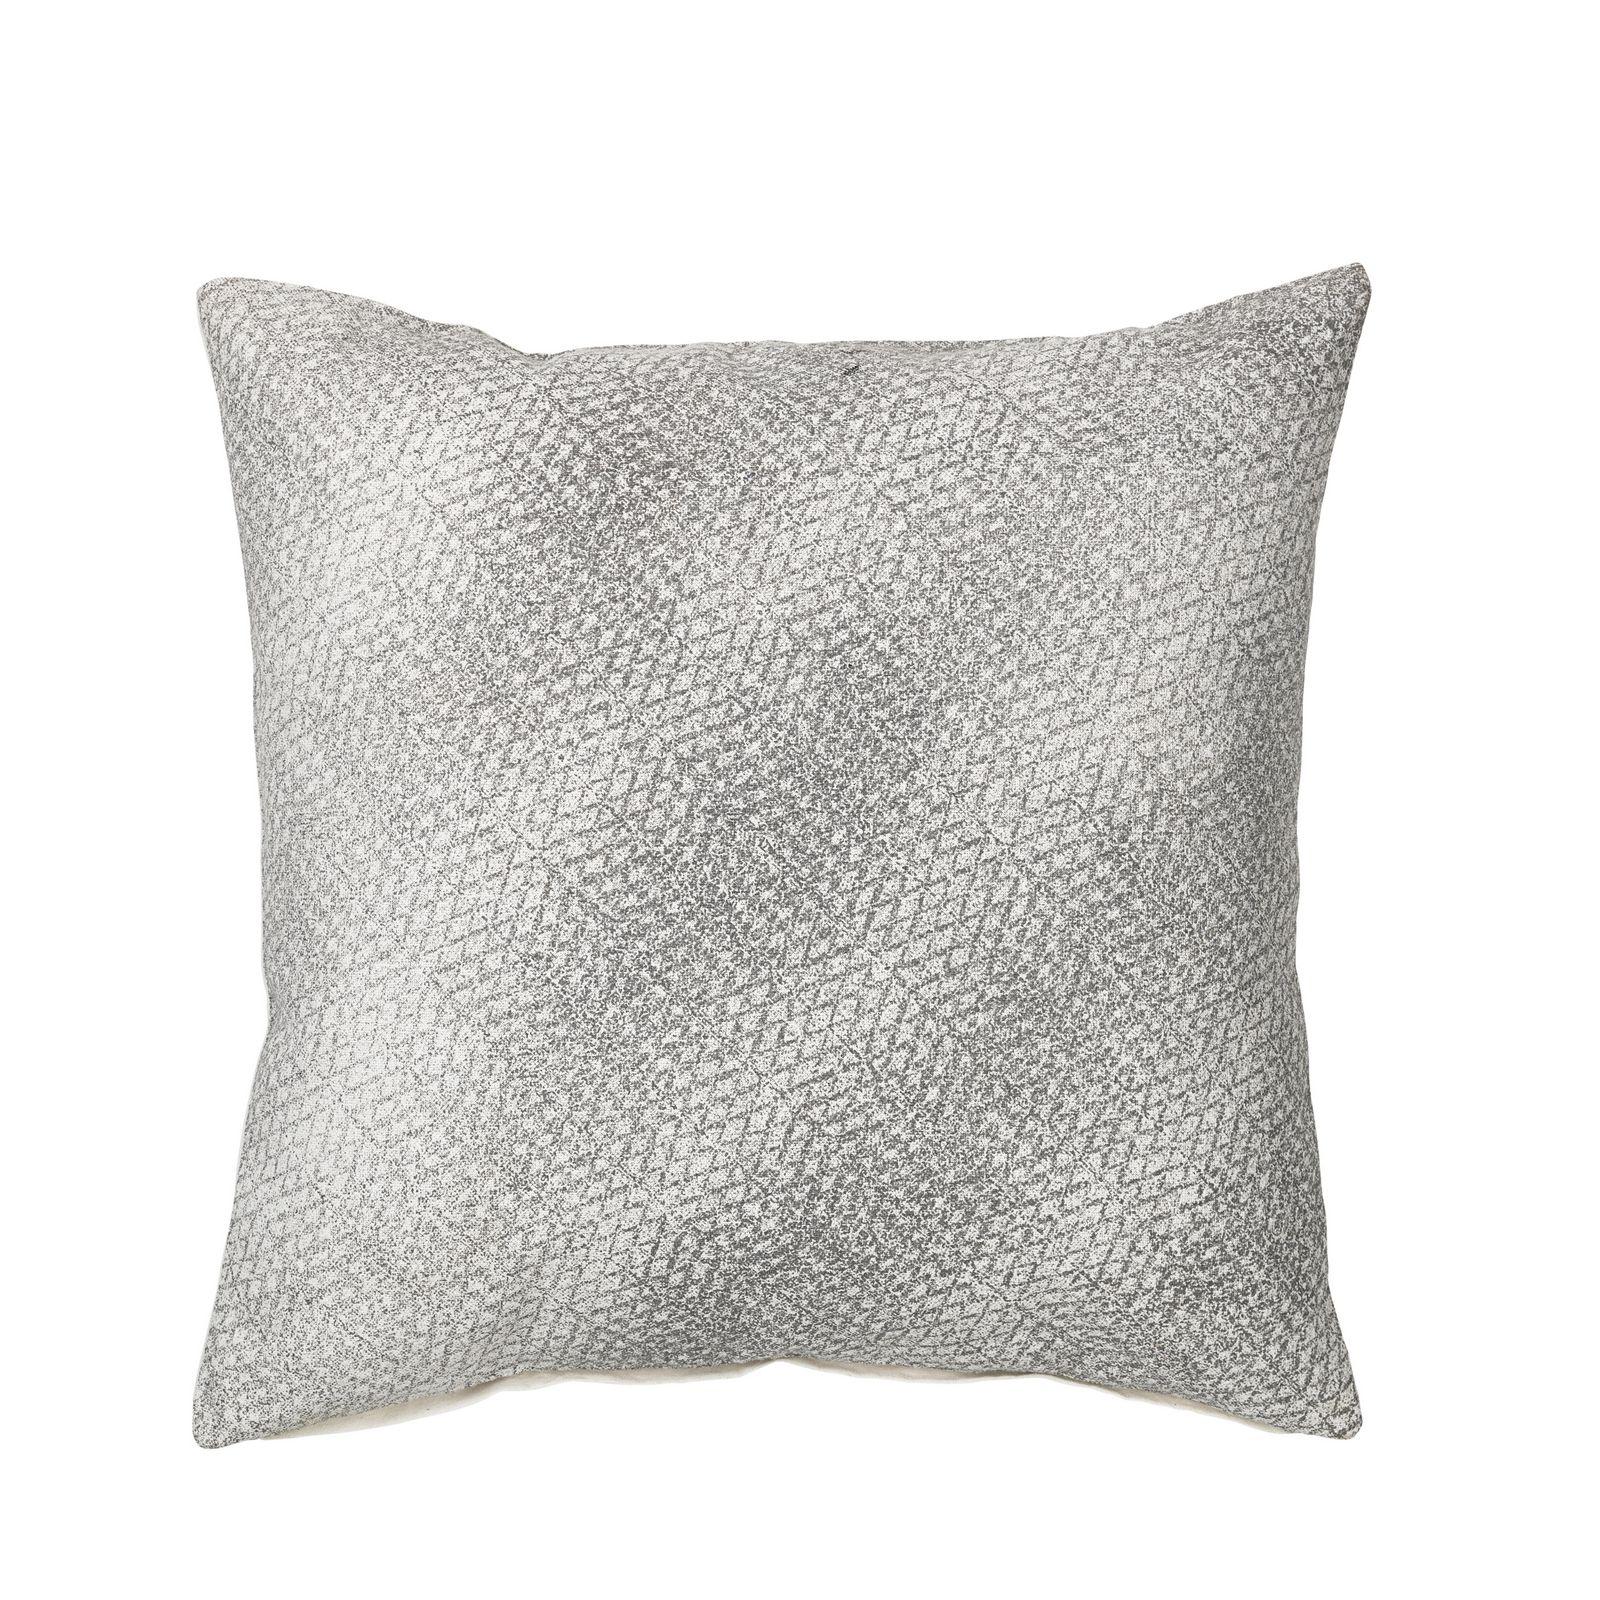 Наволочка декоративная Broste Gabriel, цвет: светло-серый, 50х50 см. 70120785